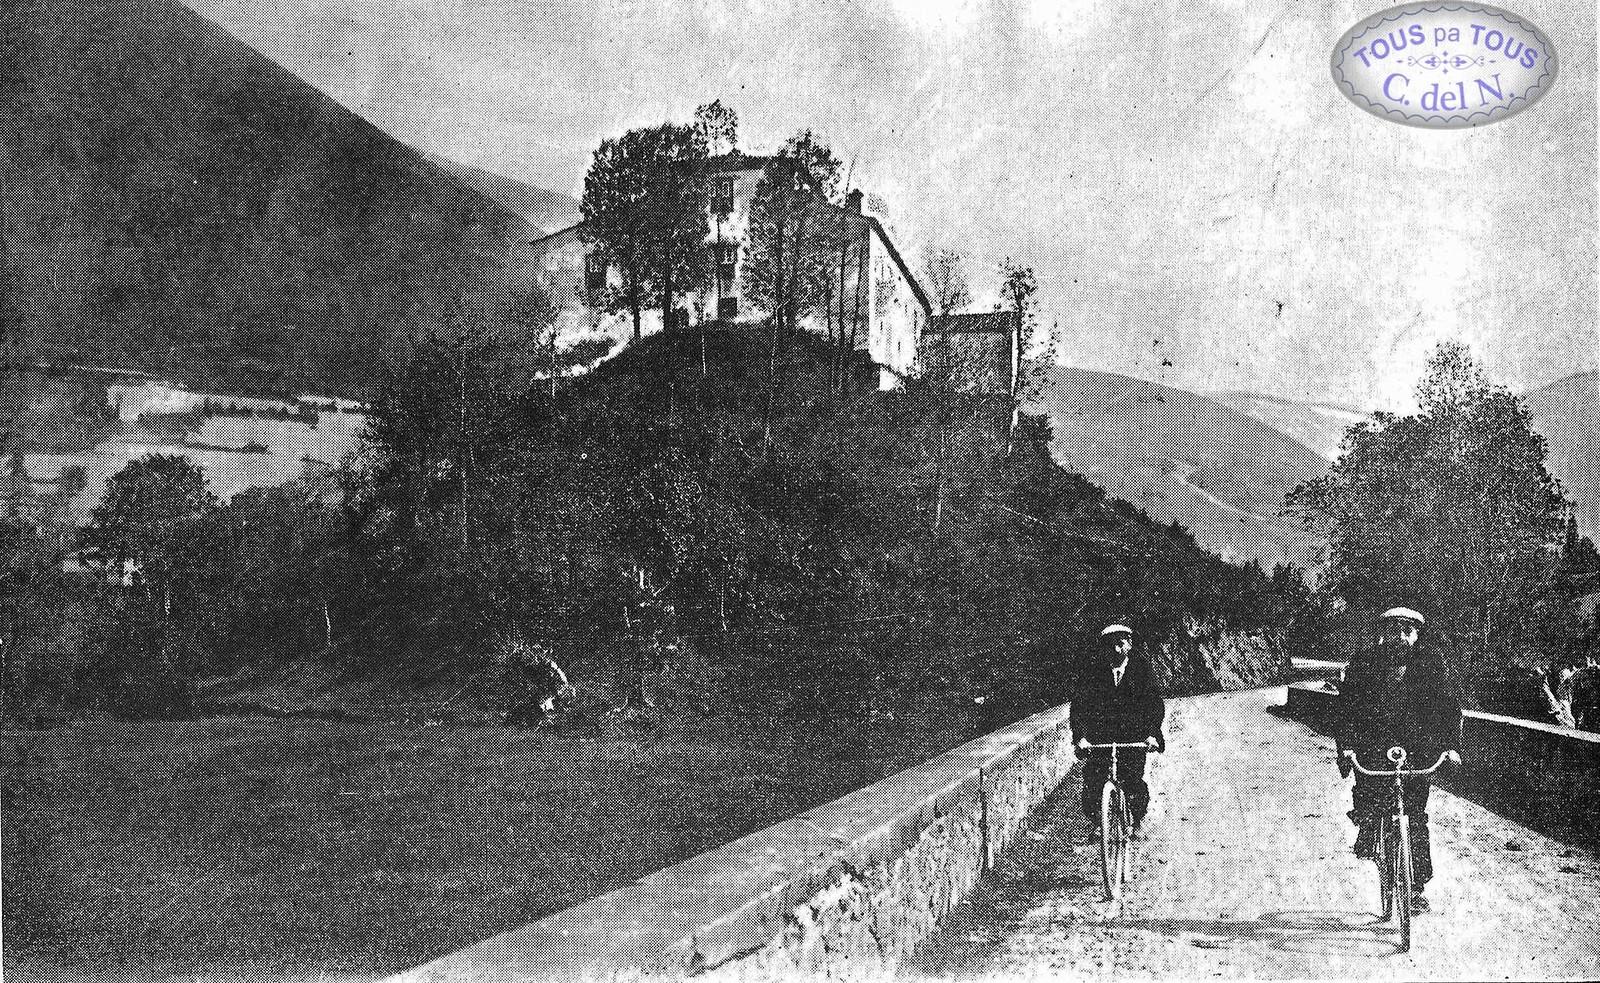 1915 - Valle de Cibea